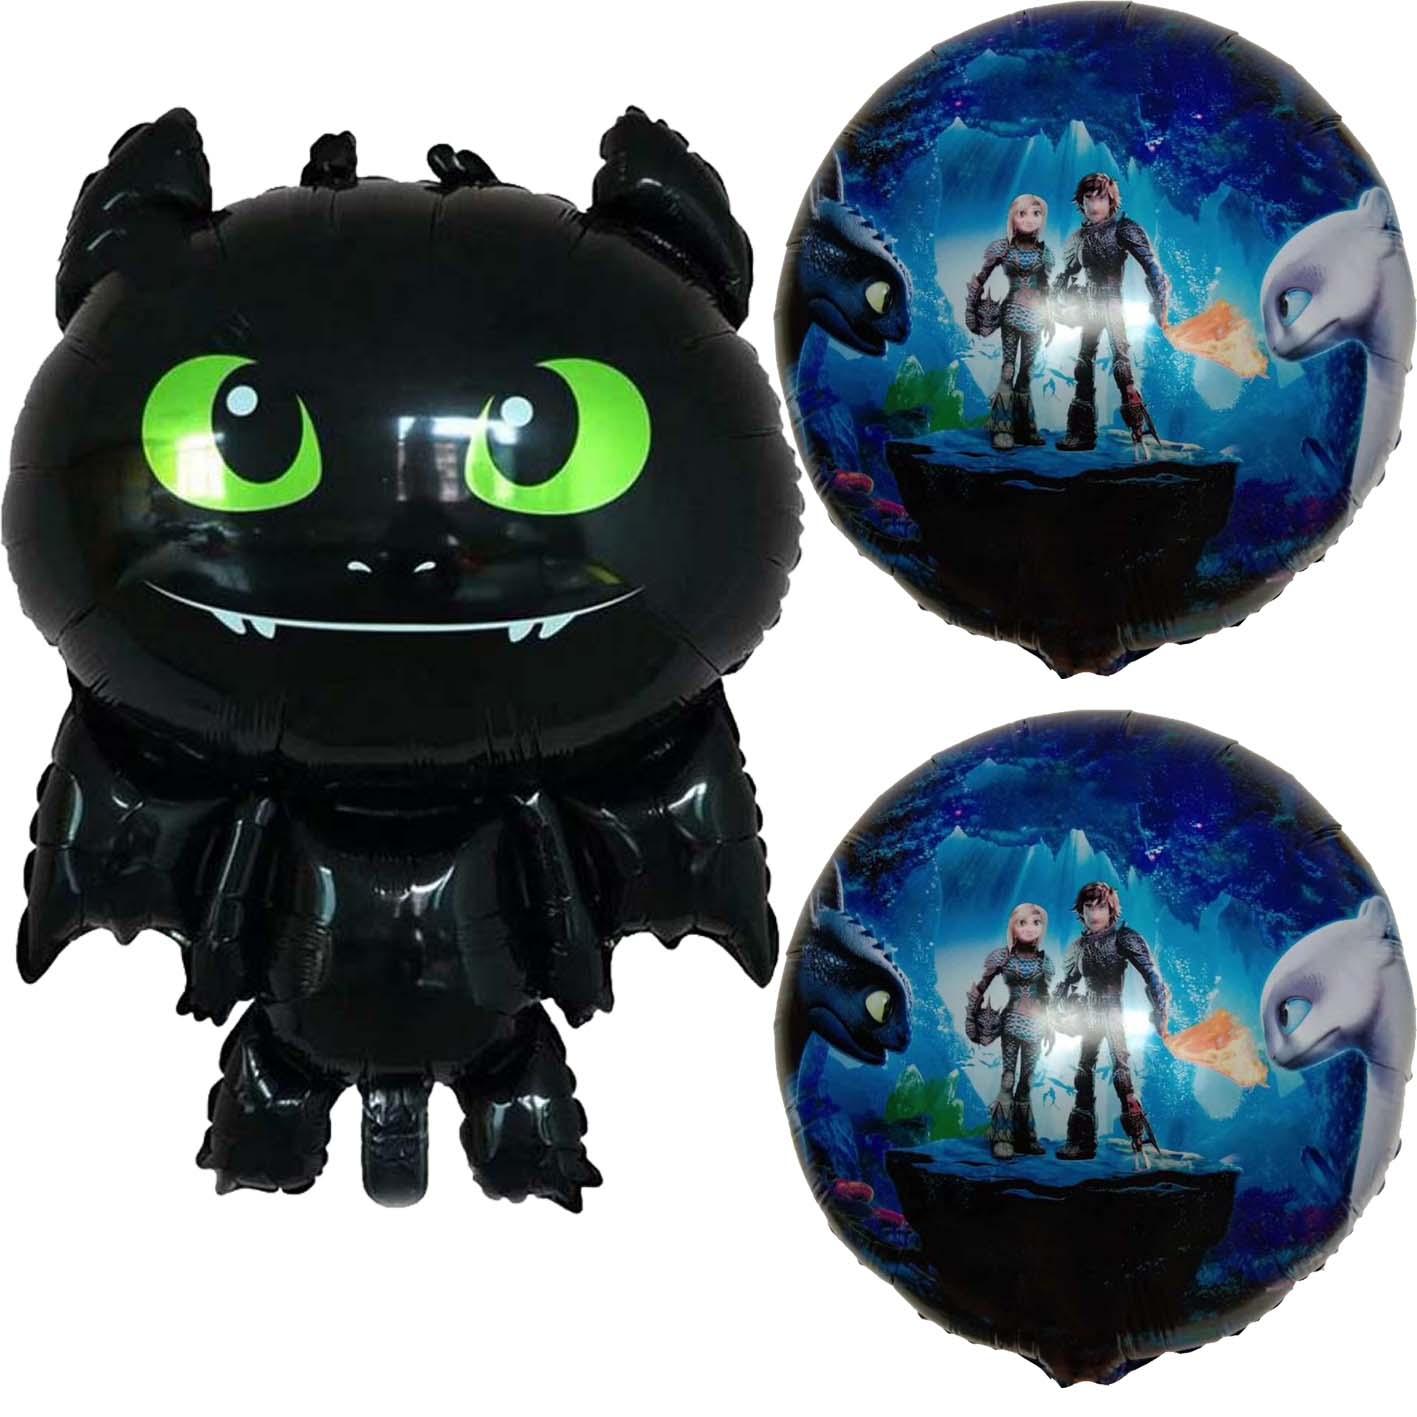 1 Pcs How To Train Your Dragon Balloon Big Black Dragon Toothless Ballons Deco Birthday Party Baby Boy Theme Hero Decoration Toy